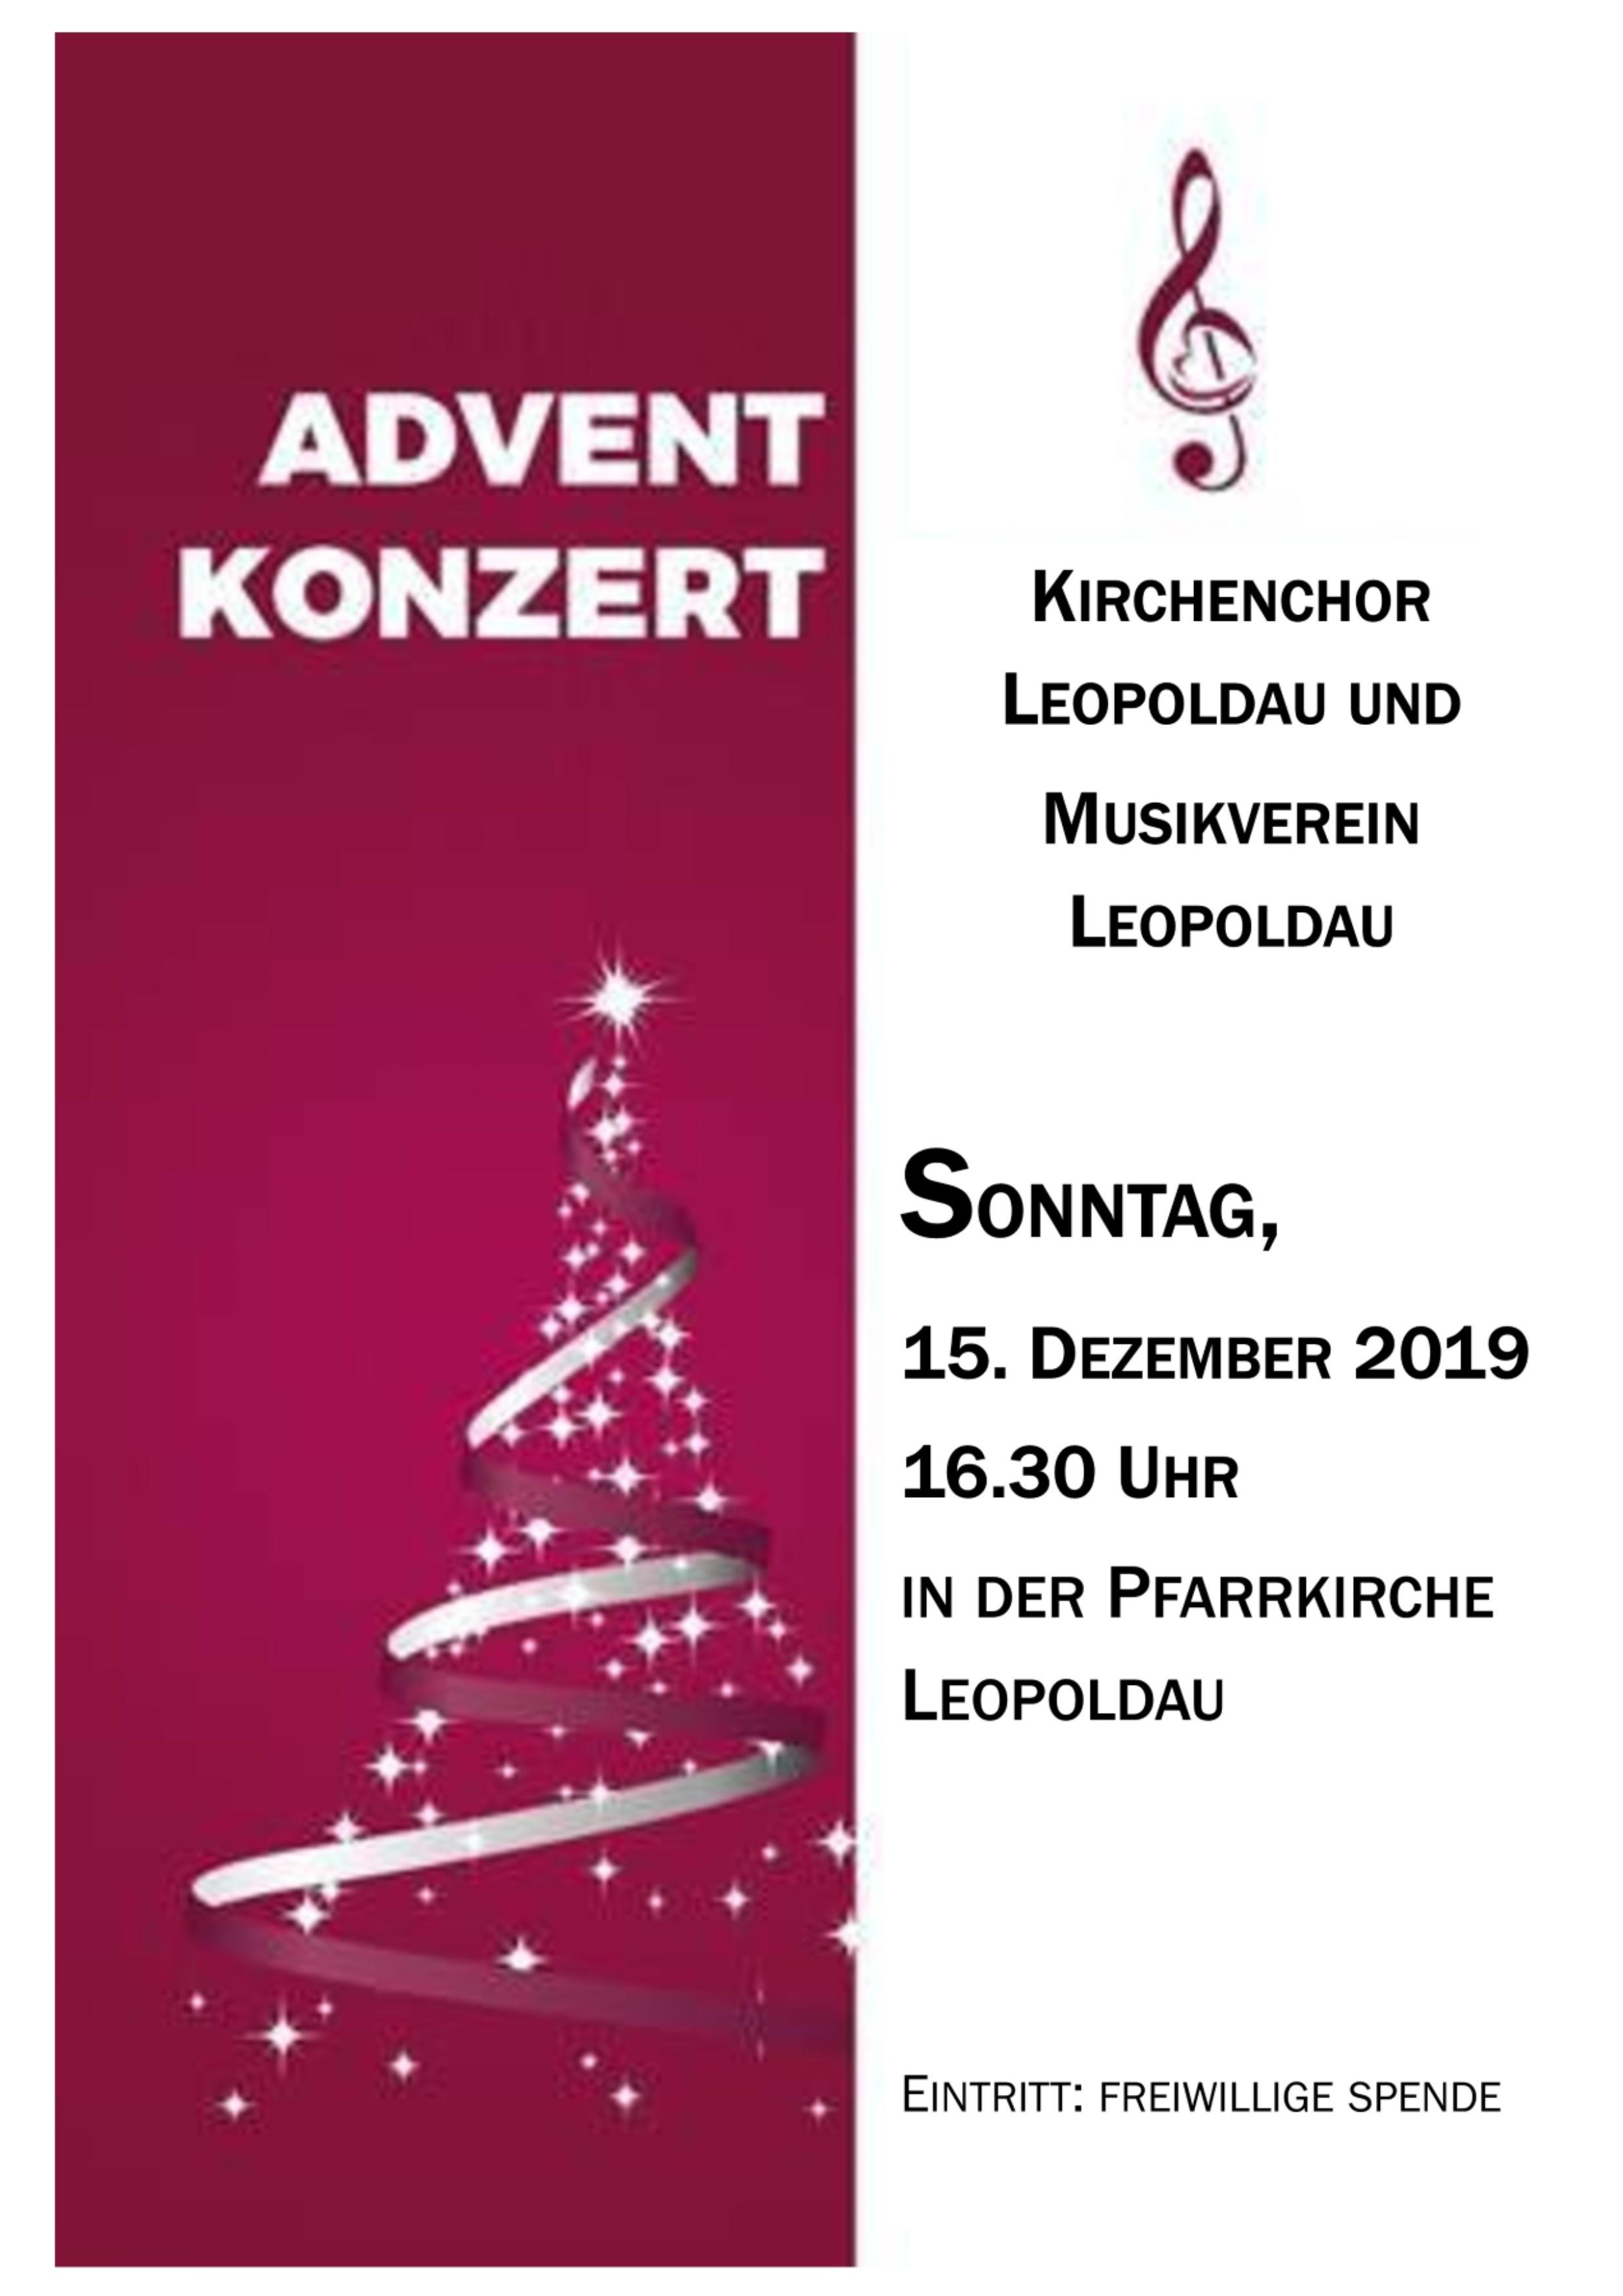 Adventkonzert 2019